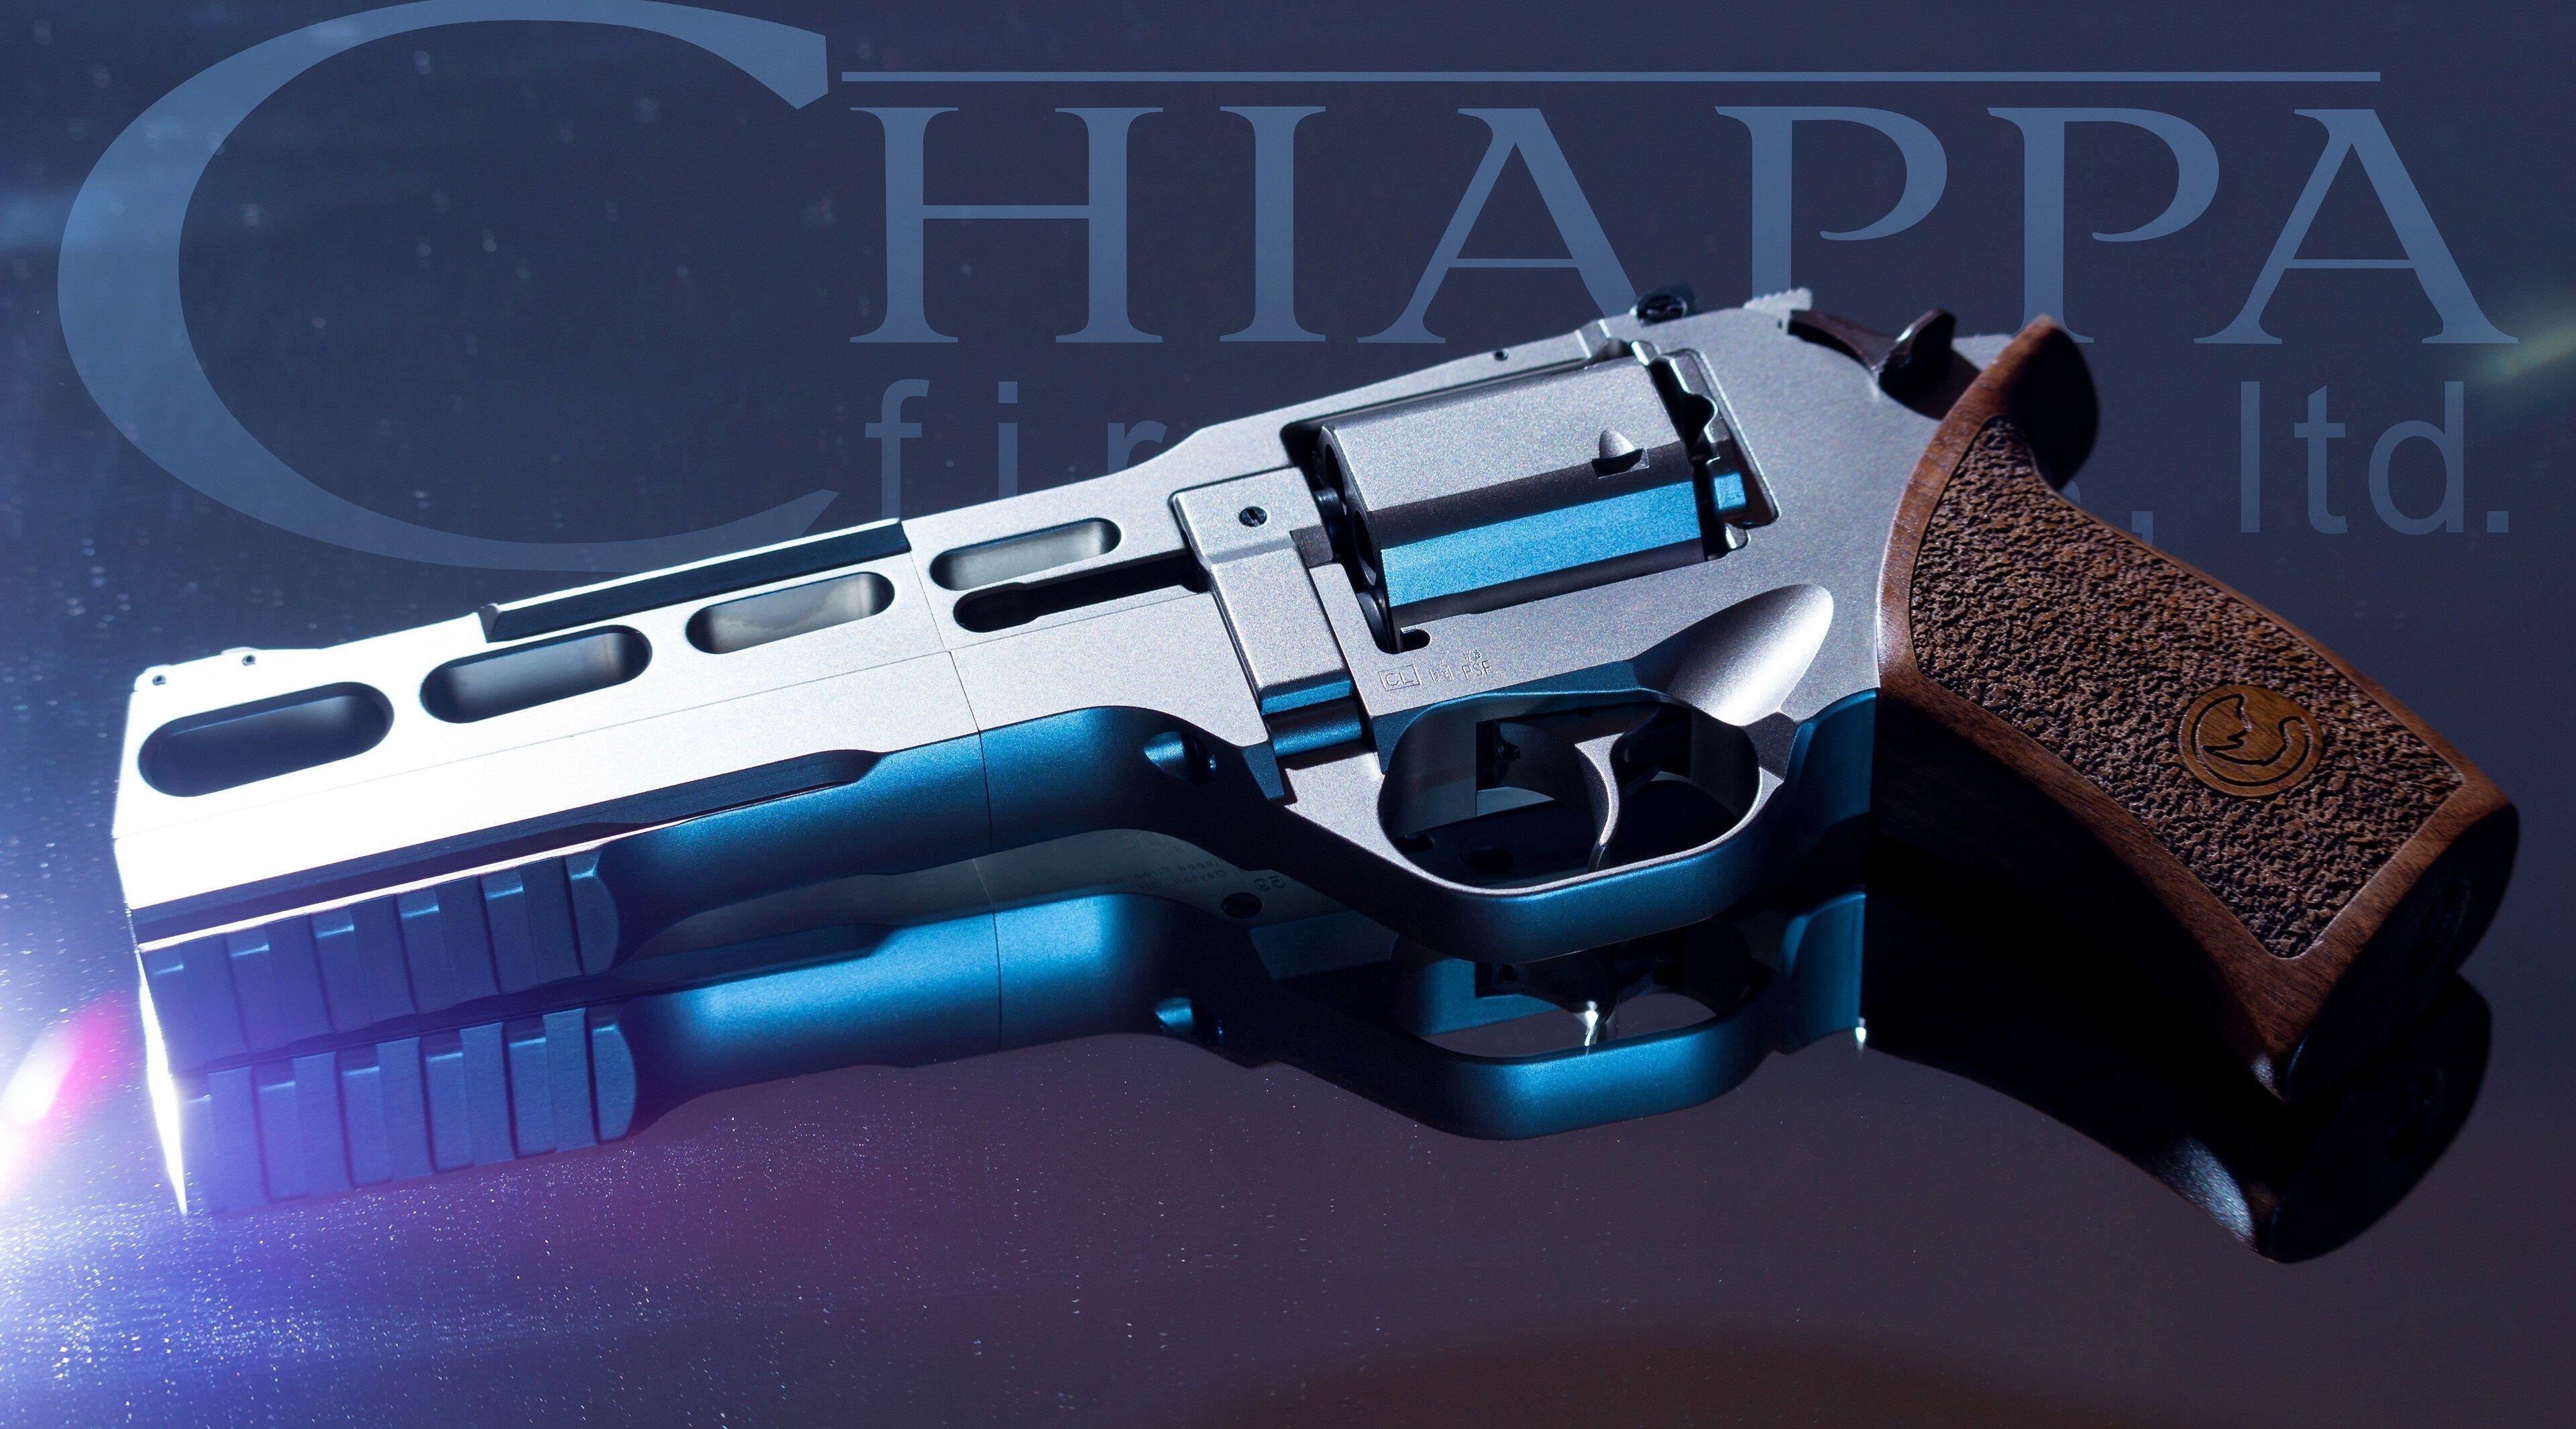 3840x2130 Rhino 60ds 4k Wallpaper Hd Full Screen Guns Wallpaper Guns Hd Wallpaper